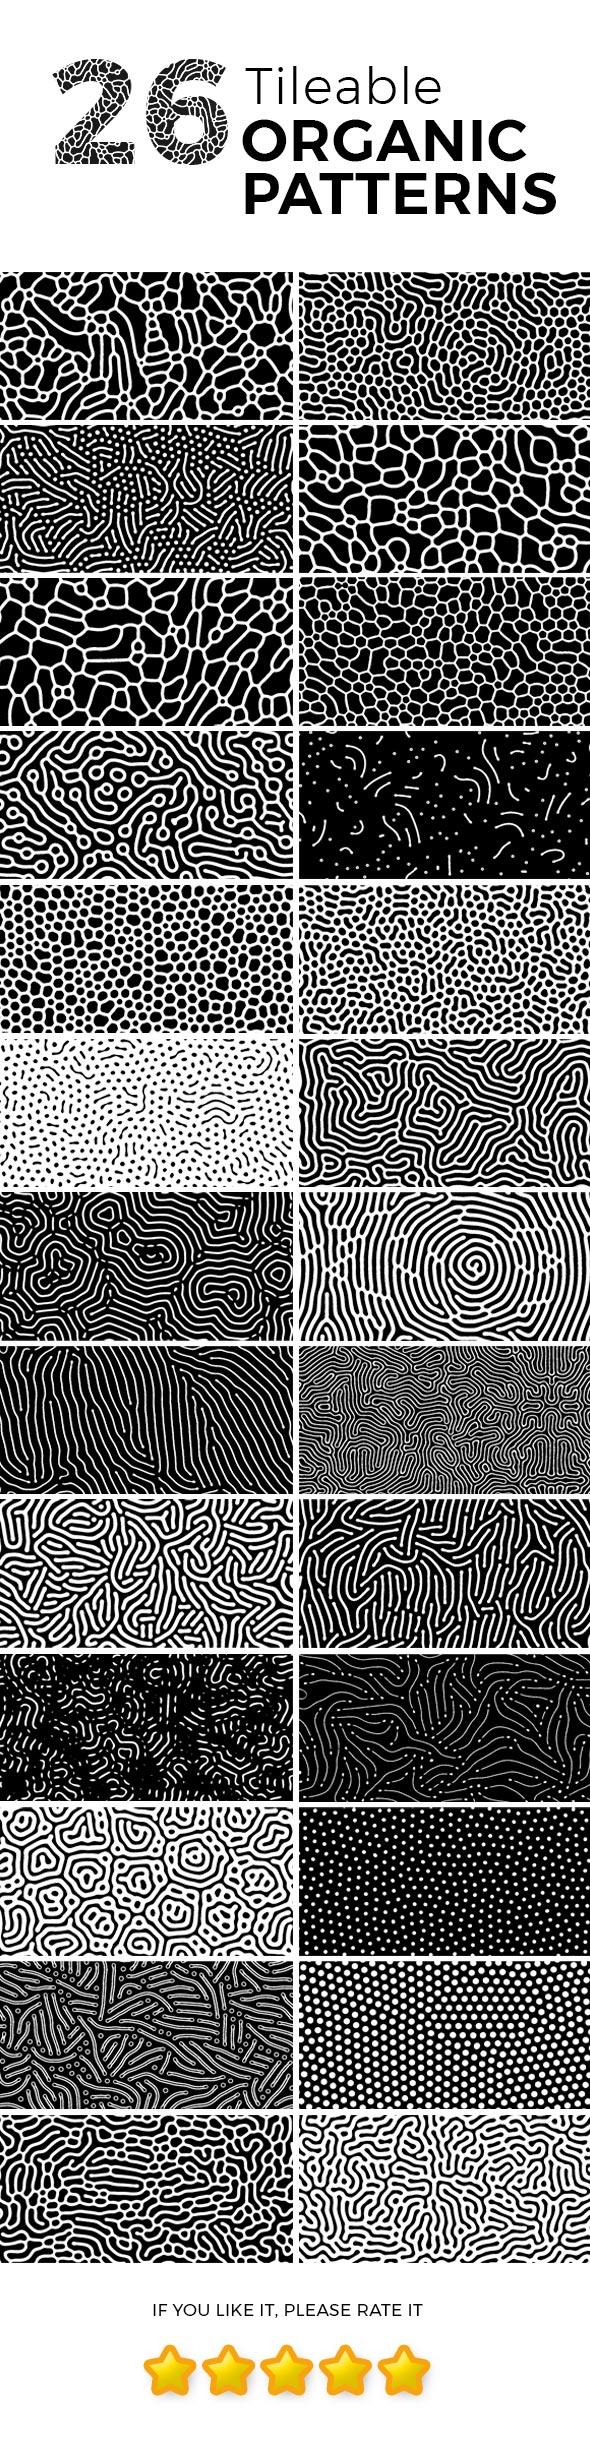 26 Tileable Organic Patterns - Textures / Fills / Patterns Photoshop